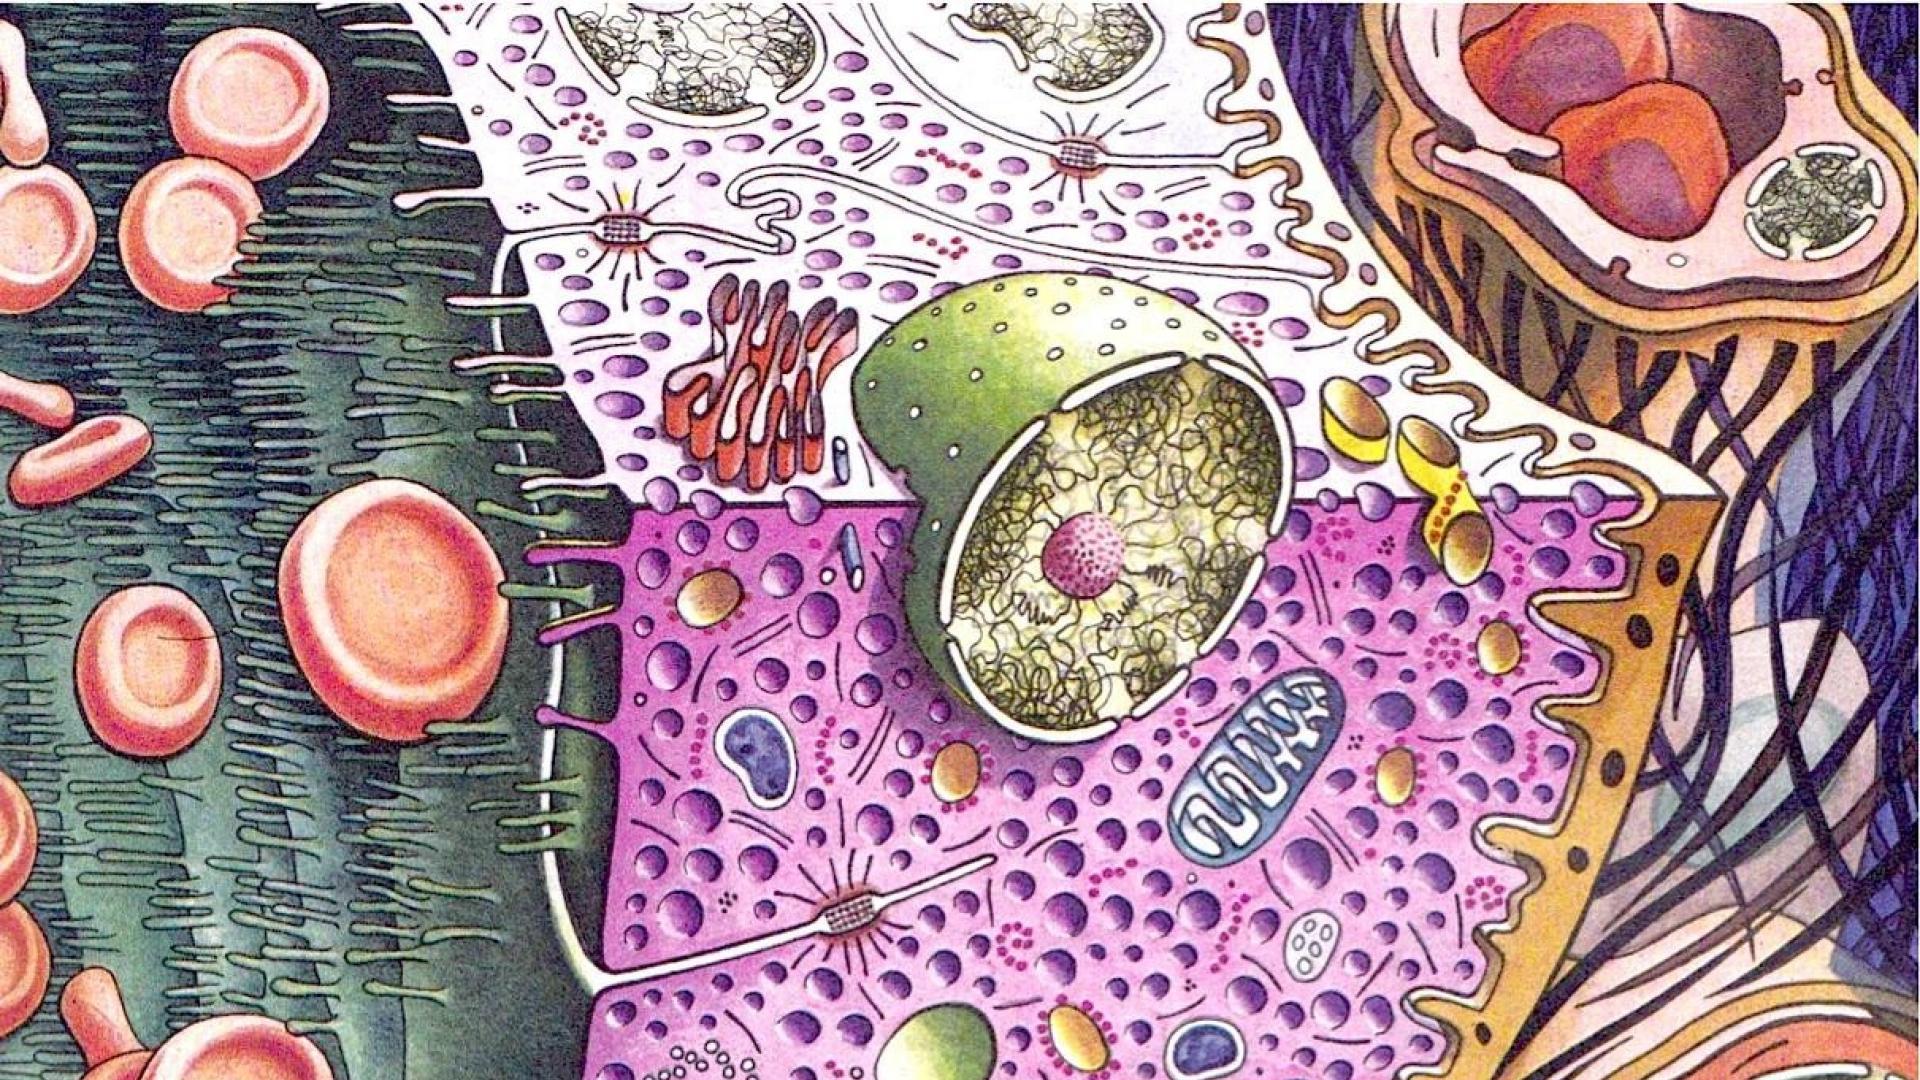 Biology artwork cells science wallpaper 65849 1920x1080